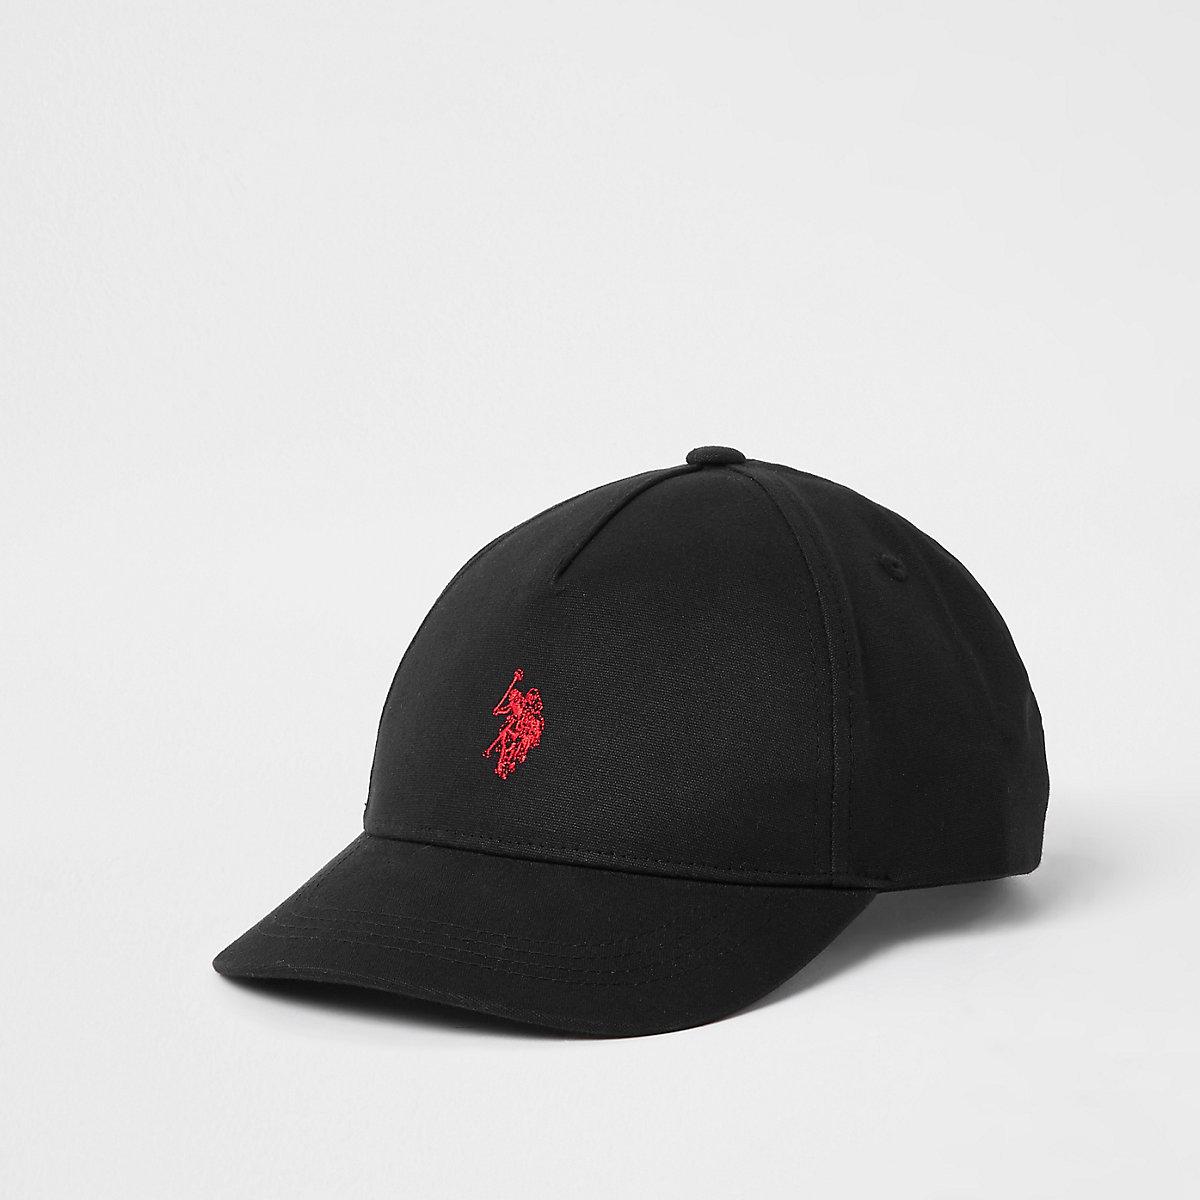 Boys black U.S. Polo Assn. cap - Hats - Accessories - boys d2b0f1a90f1